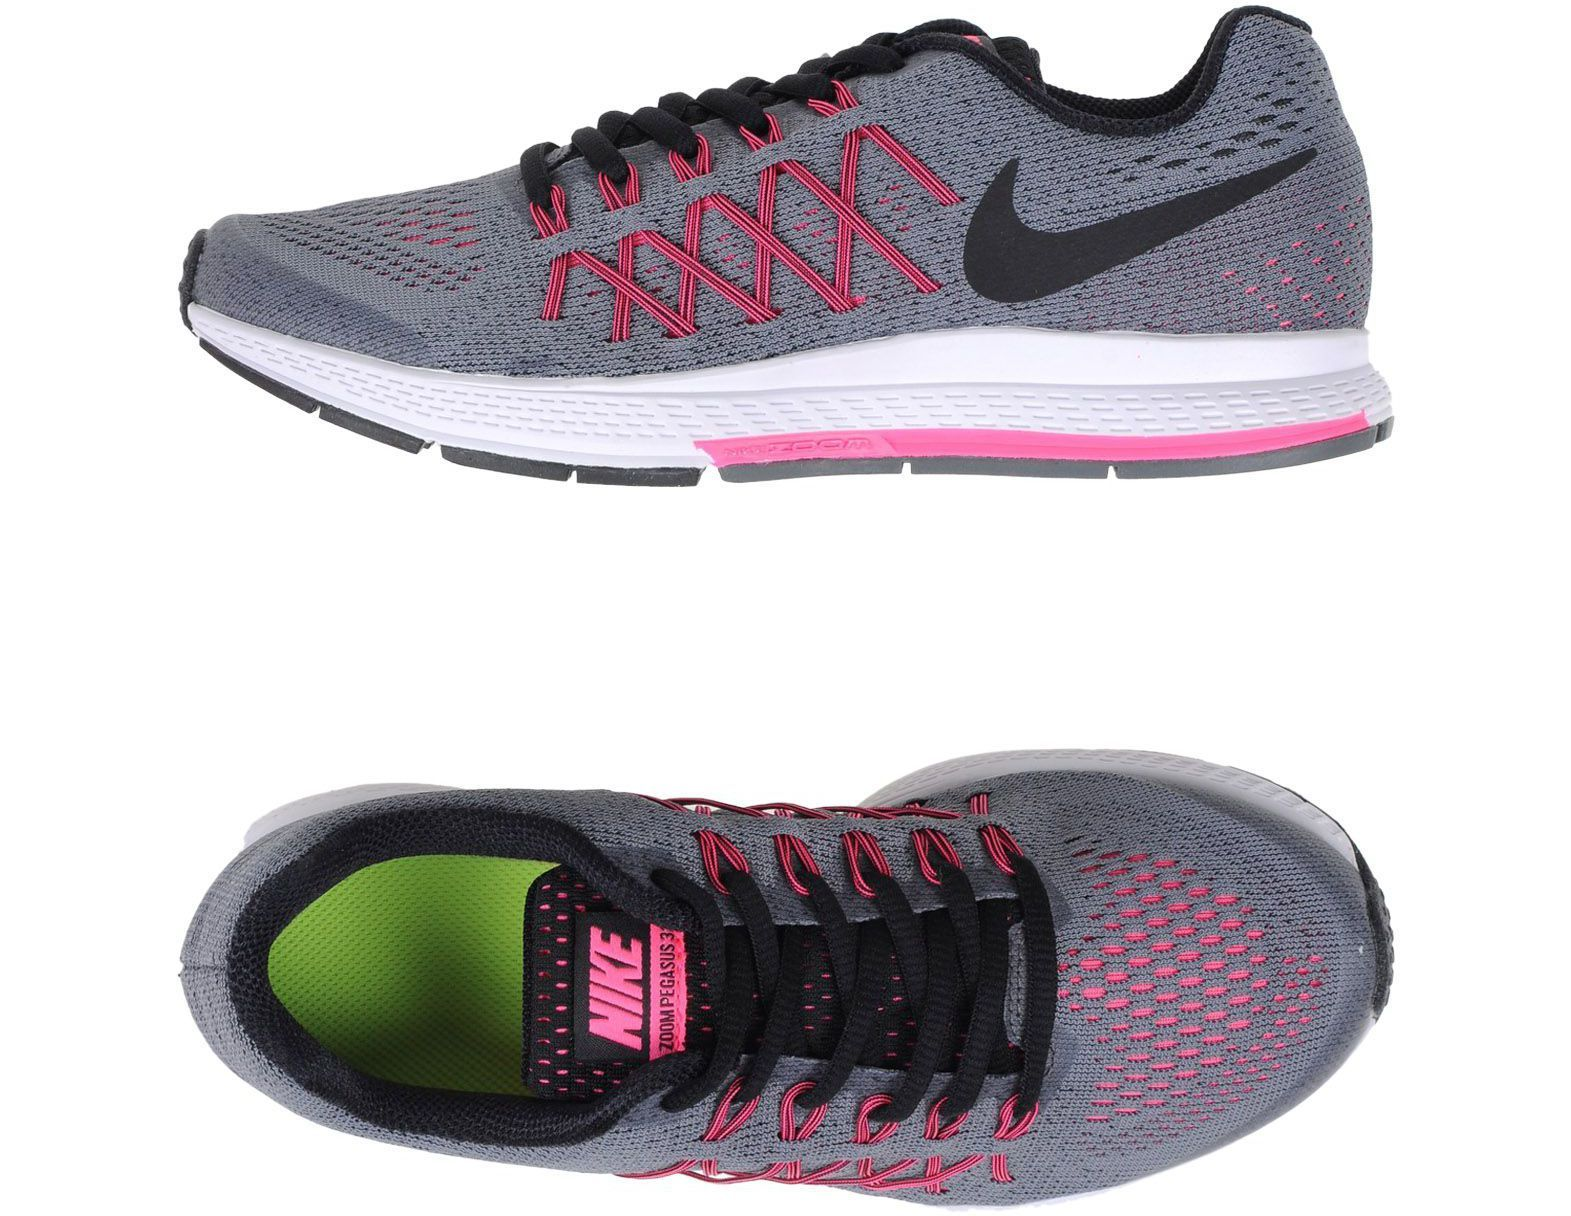 finest selection d04a0 713ac NIKE ΠΑΠΟΥΤΣΙΑ Παπούτσια τένις χαμηλά  moda  style  sales